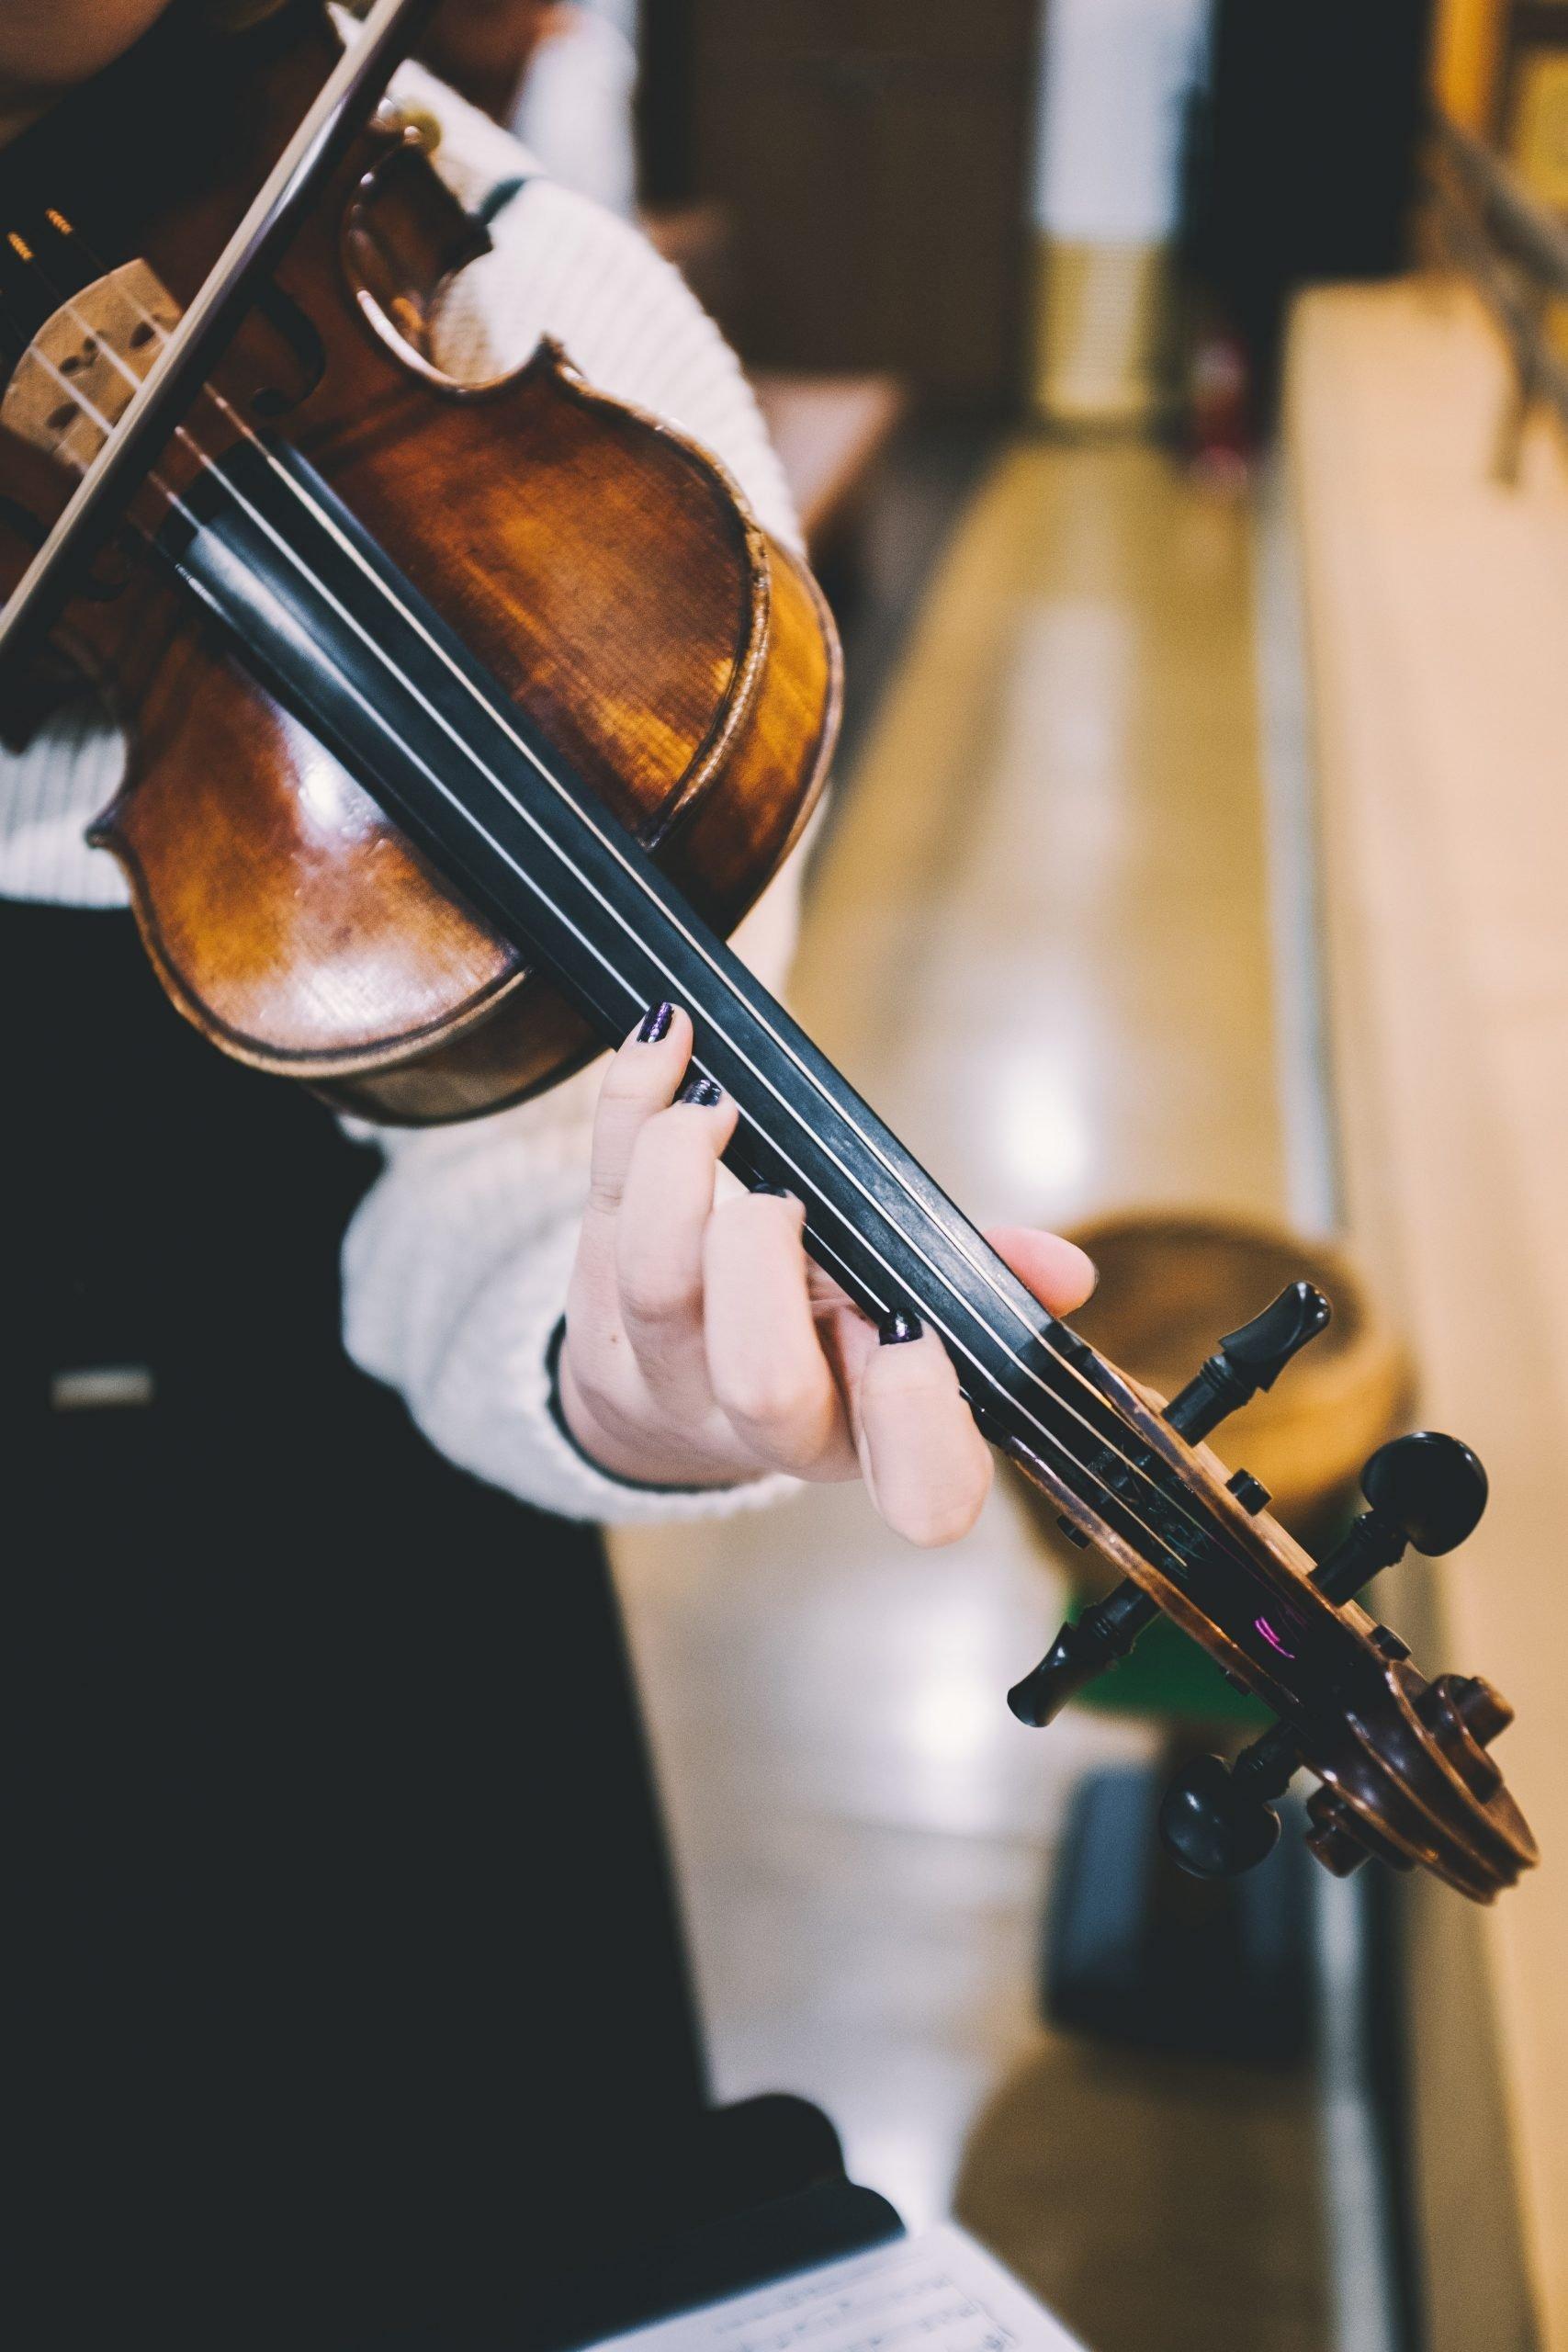 The Top Ten List of Blog Posts Every Violin Teacher Should Read